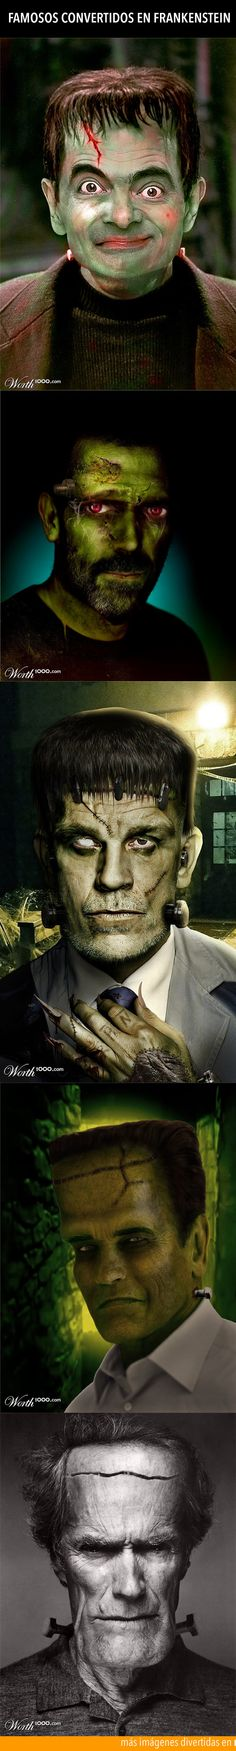 Famosos convertidos en Frankenstein.